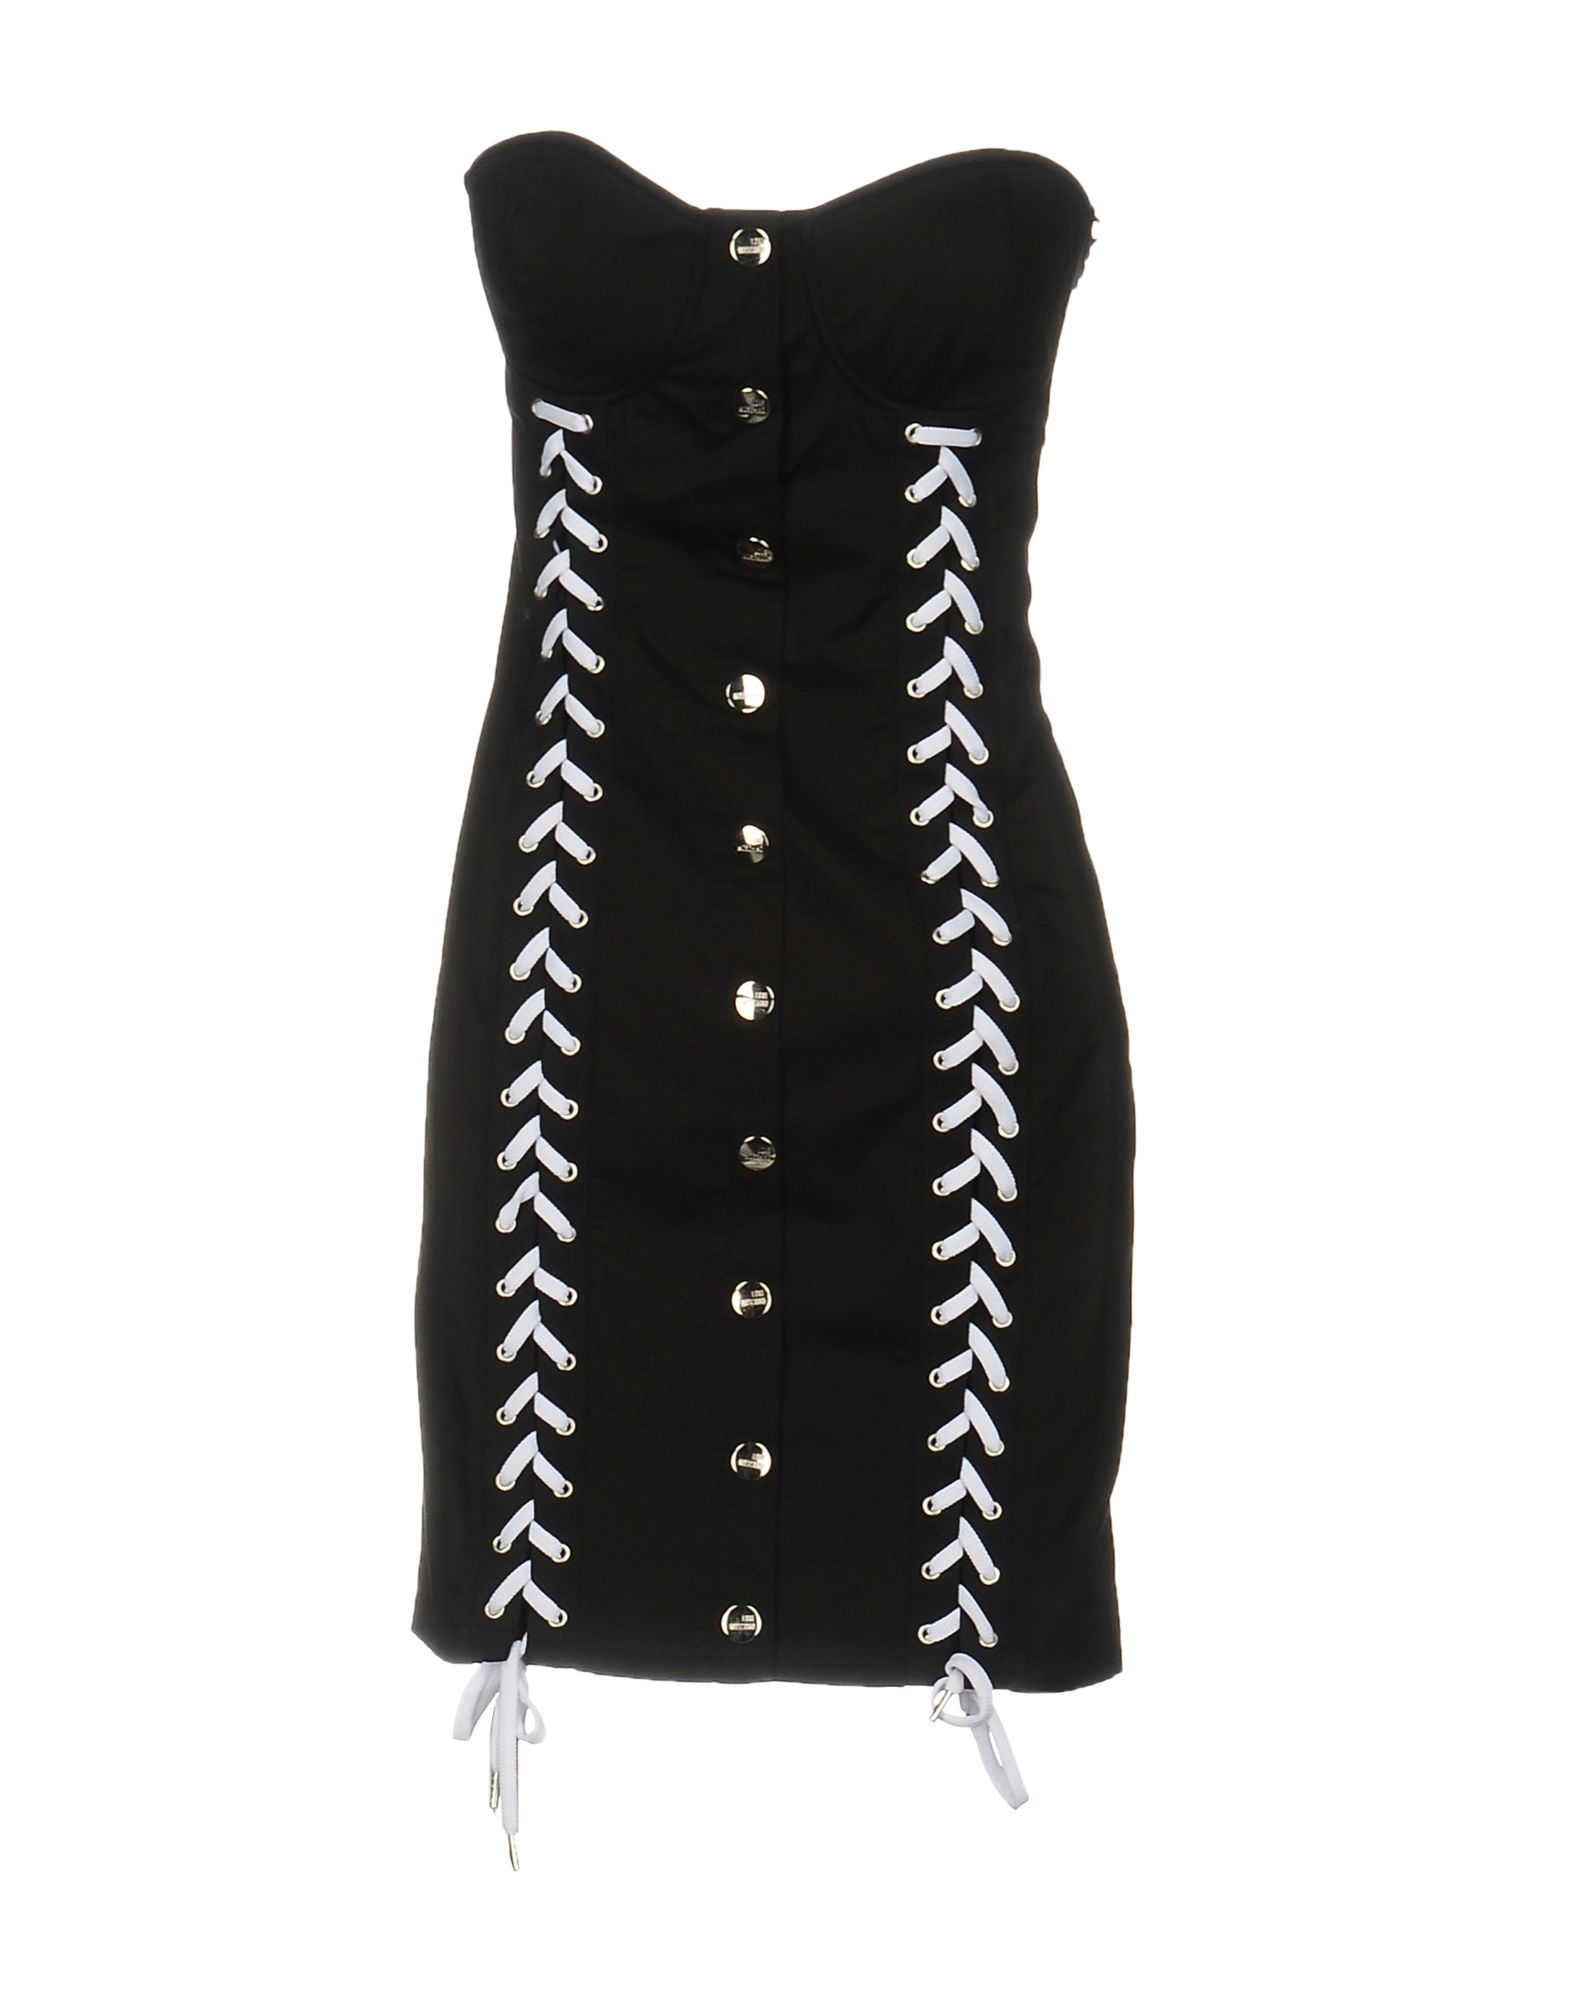 LOVE MOSCHINO Короткое платье makoday шерстяное платье футляр